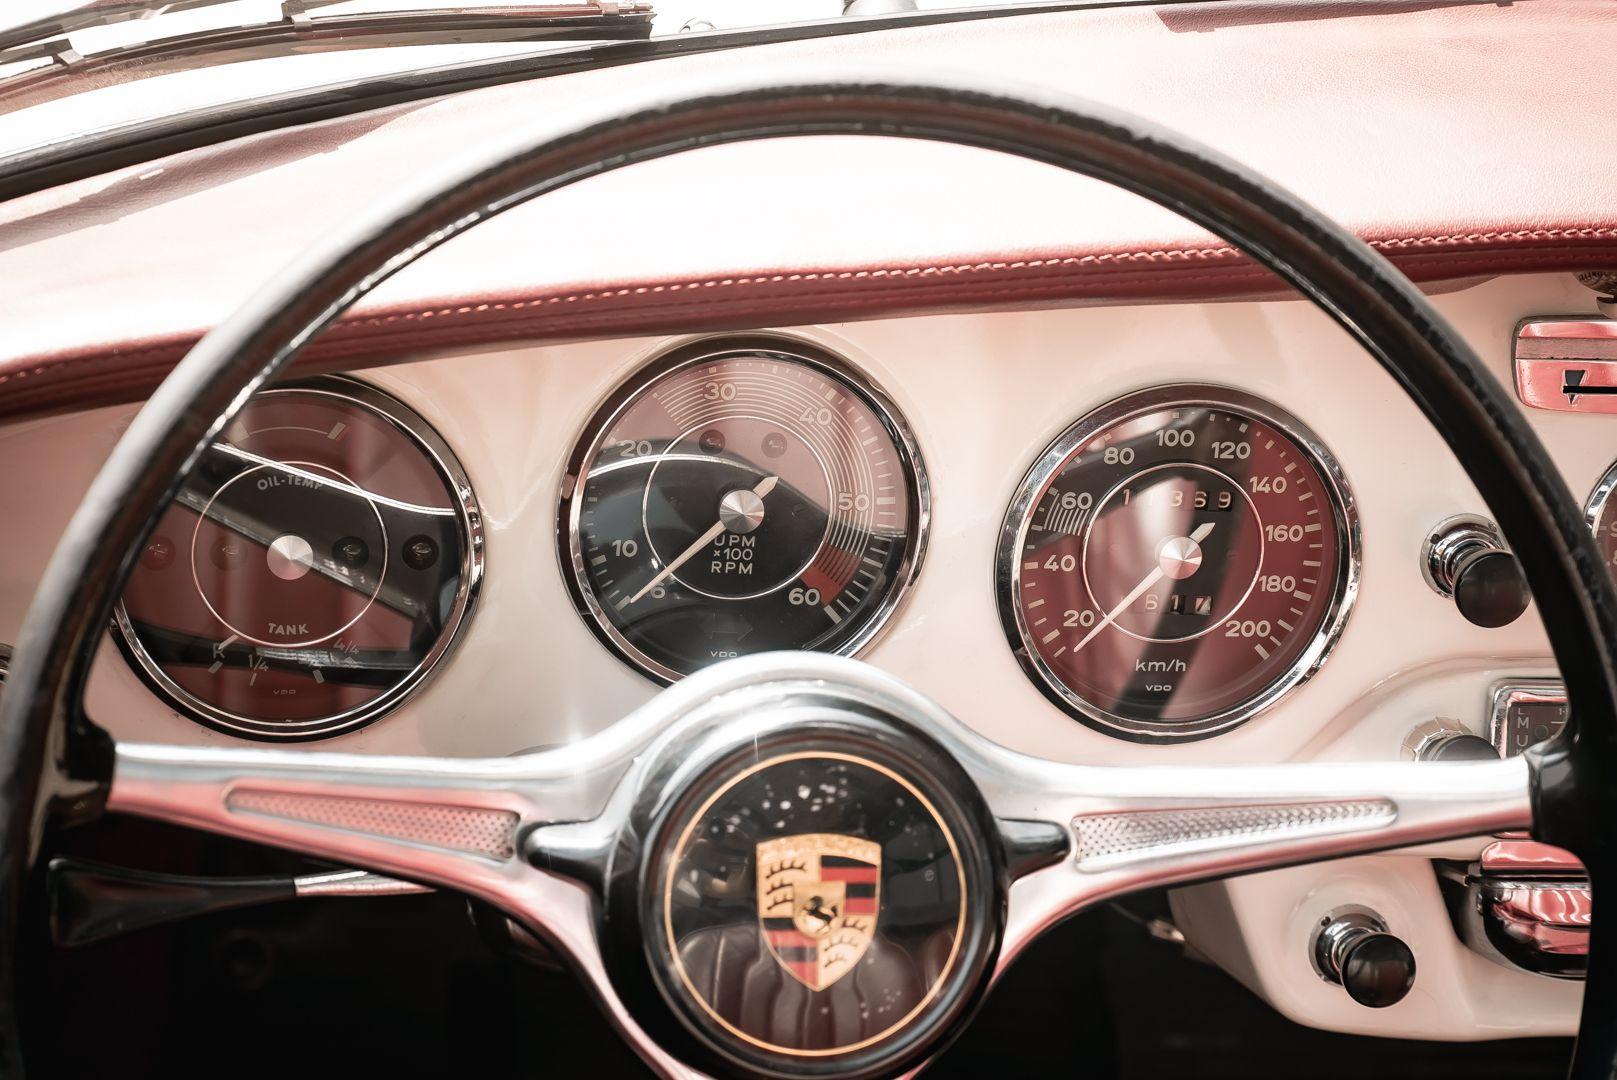 1964 PORSCHE 356 C Cabriolet 1600 SC 75455